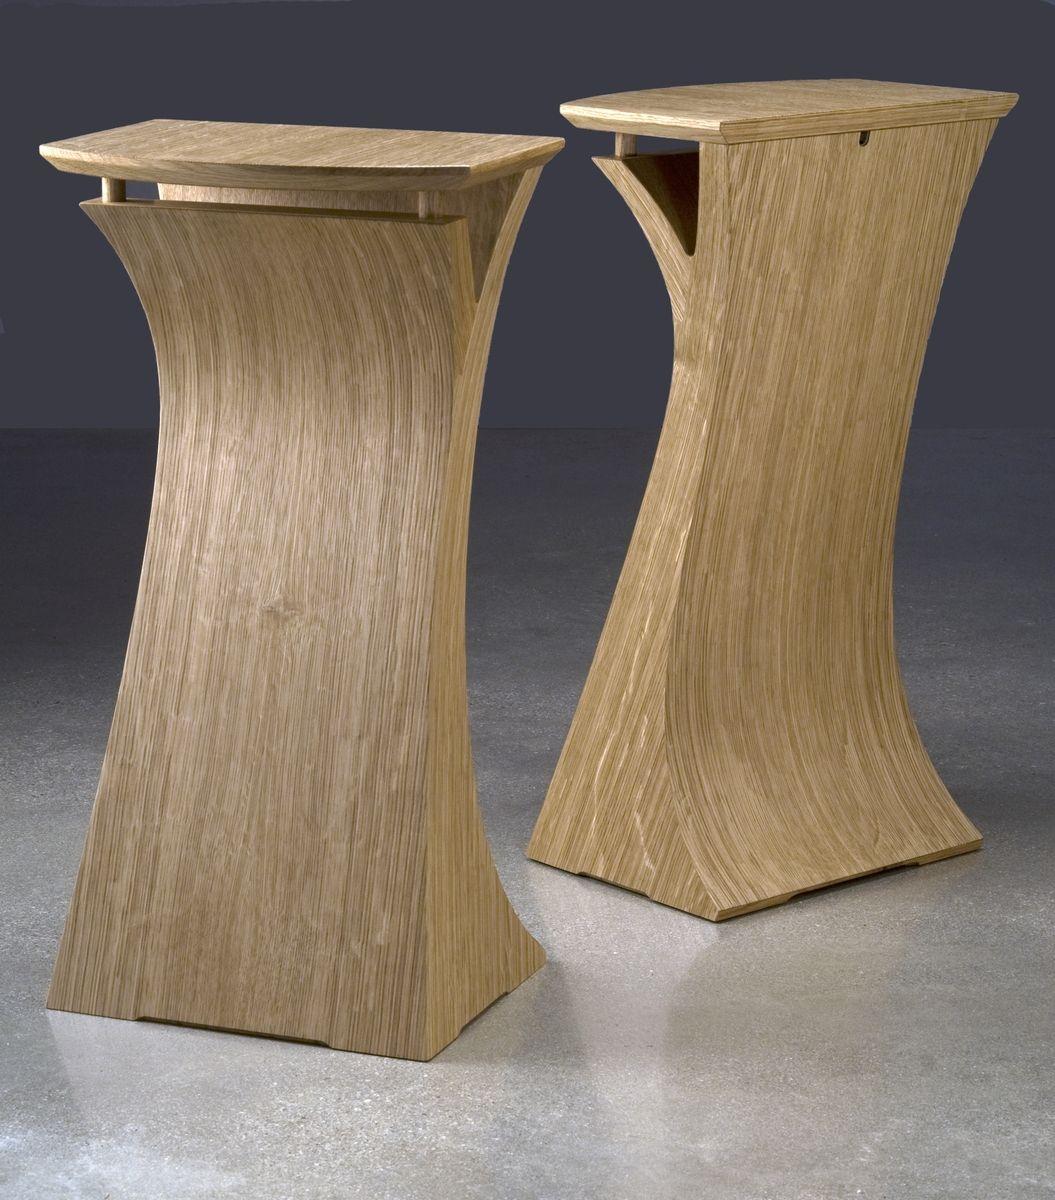 Custom made quarter sawn white oak speaker stands by eben blaney custom made quarter sawn white oak speaker stands floridaeventfo Images